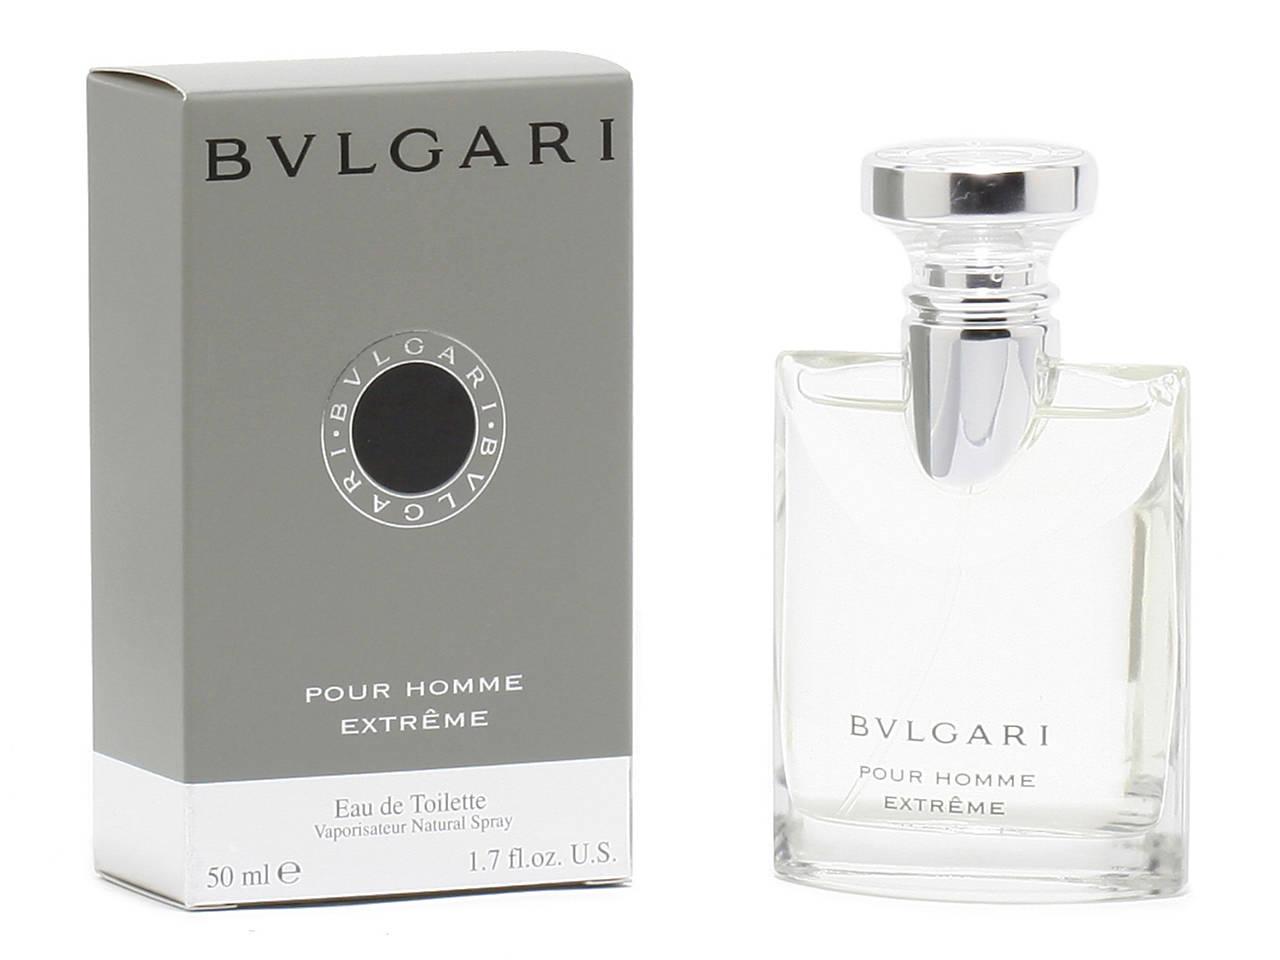 Bvlgari Fragrance Extreme Pour Homme Eau De Toilette Spray Mens Bvgari Parfume